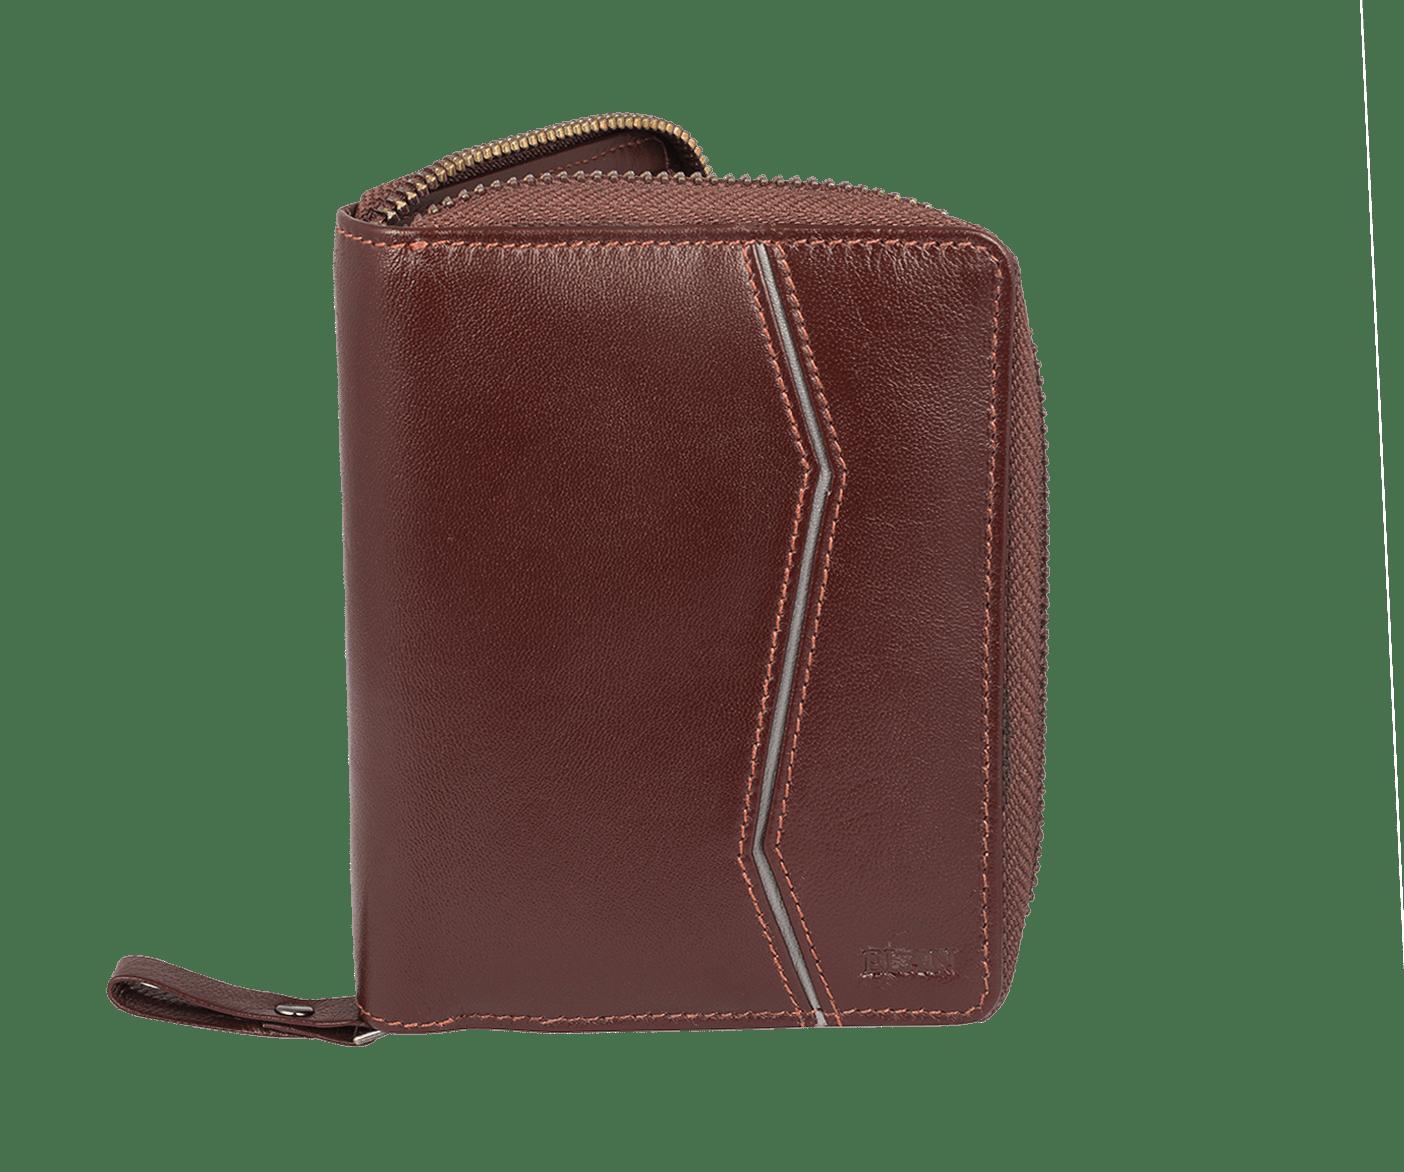 ELAN Leather Ladies Zipper Wallet